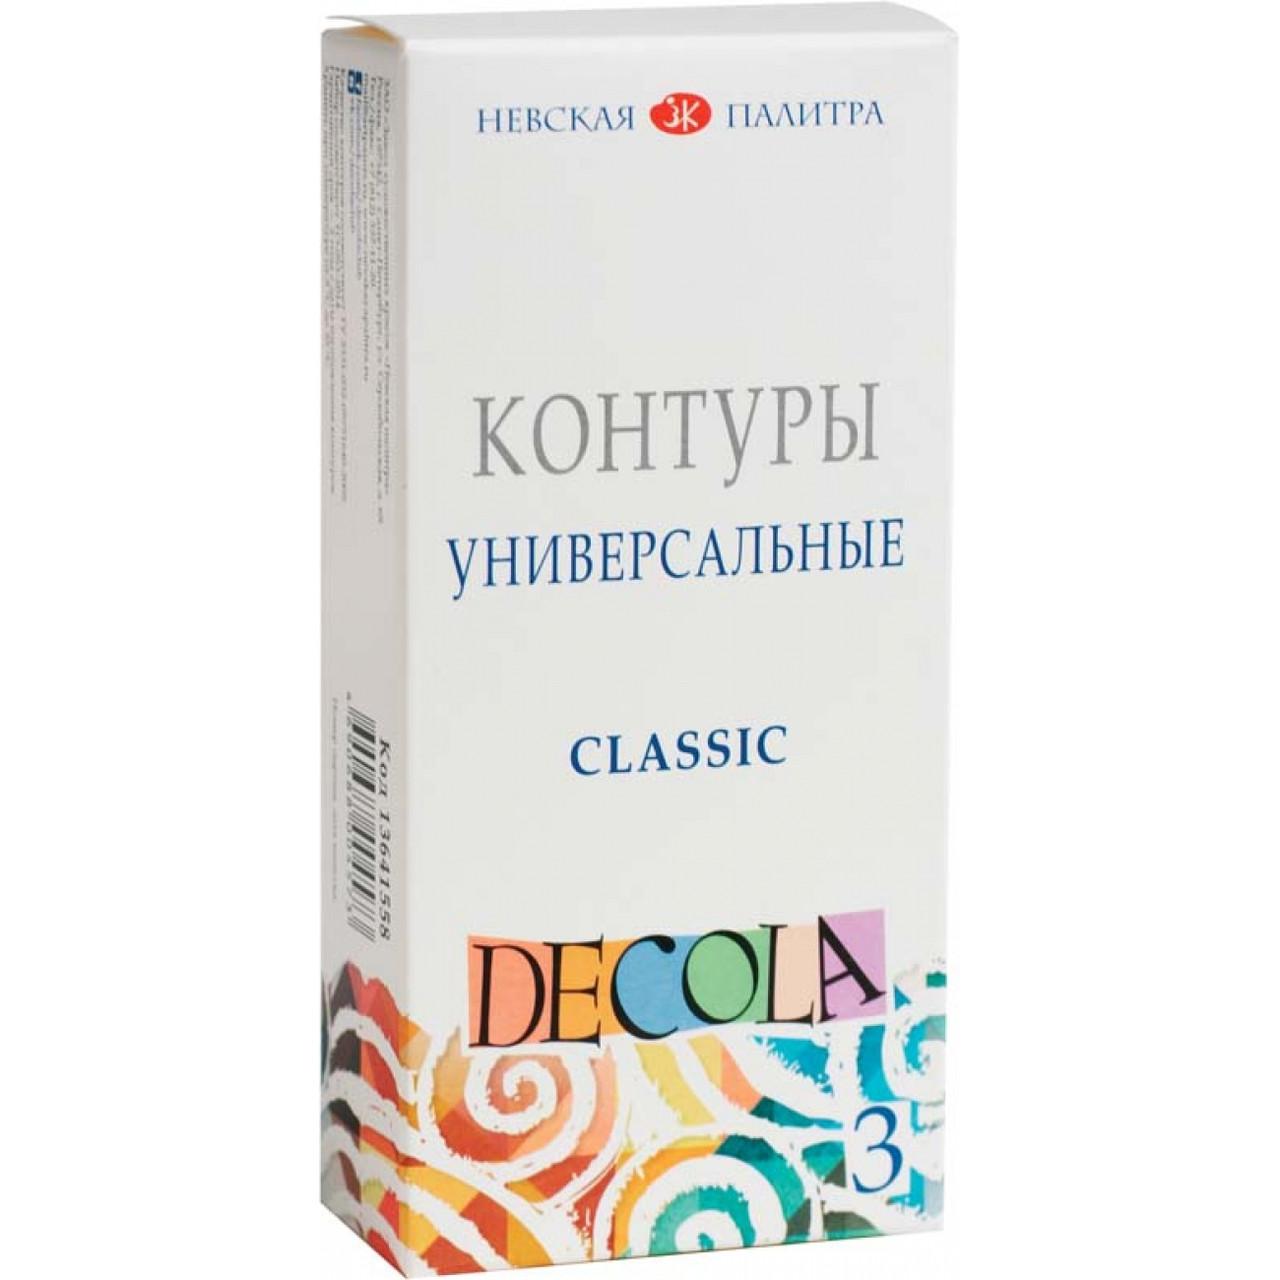 Набор контуров универс. ДЕКОЛА classic., 3цв., 18мл.